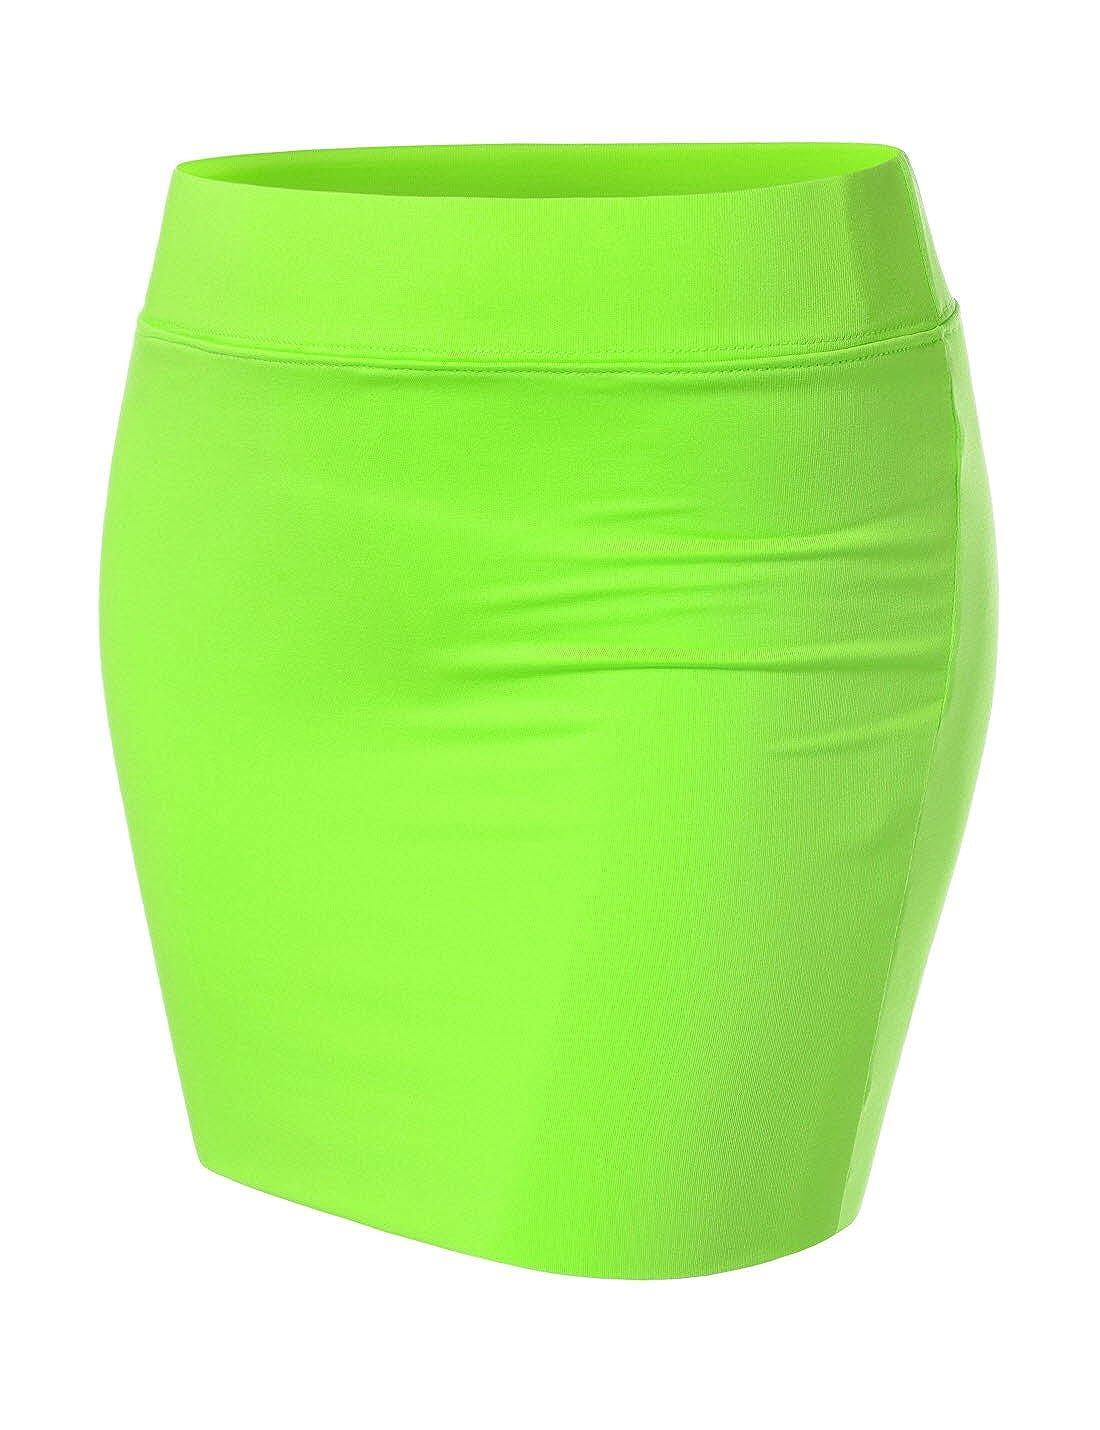 392abd237991 Green Mini Skirt Amazon – DACC